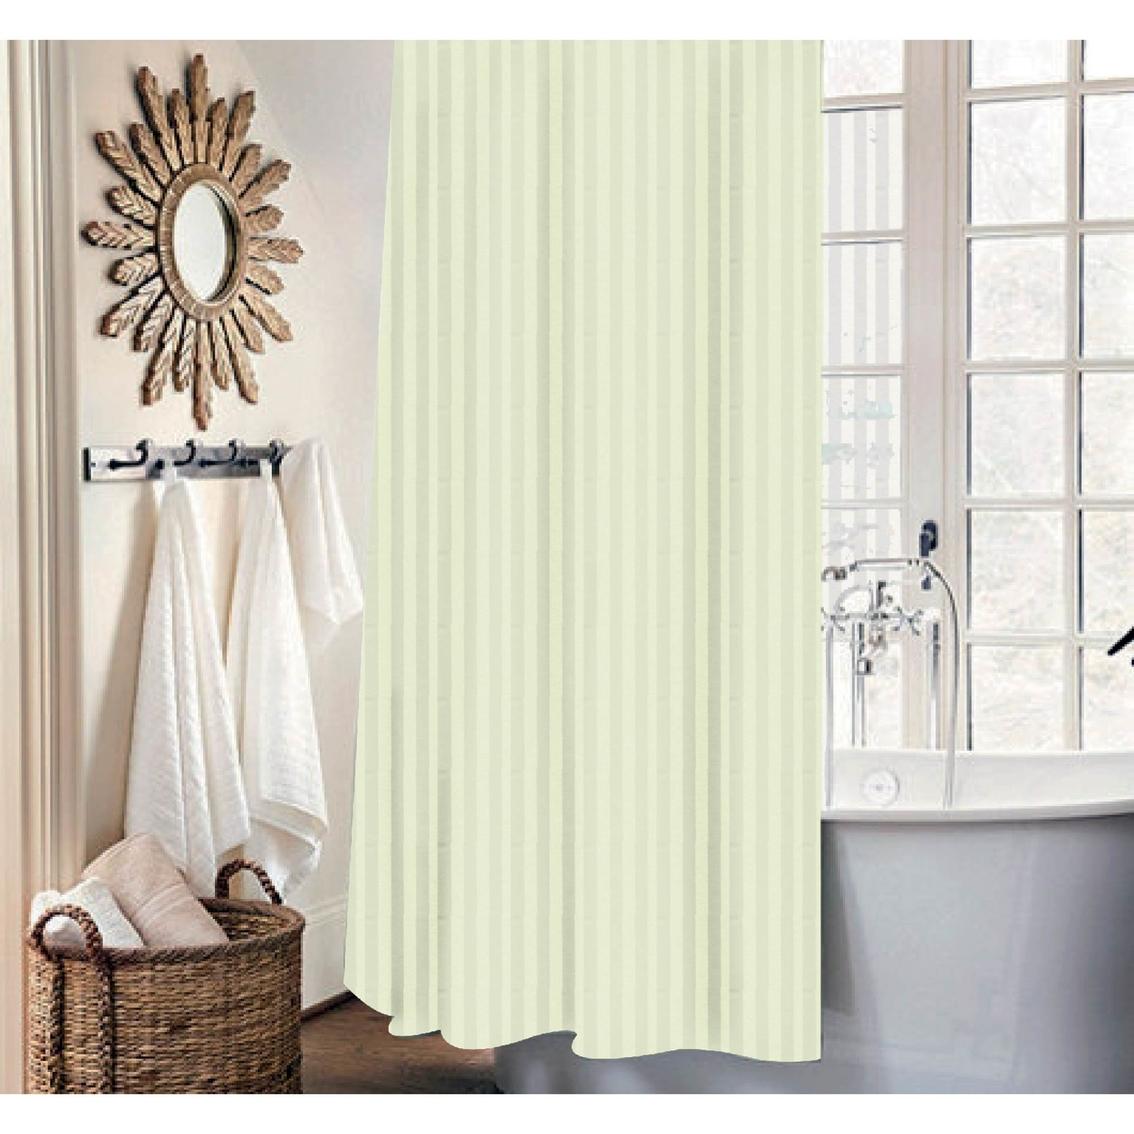 Dainty Home Mist 13 Pc Shower Curtain Set